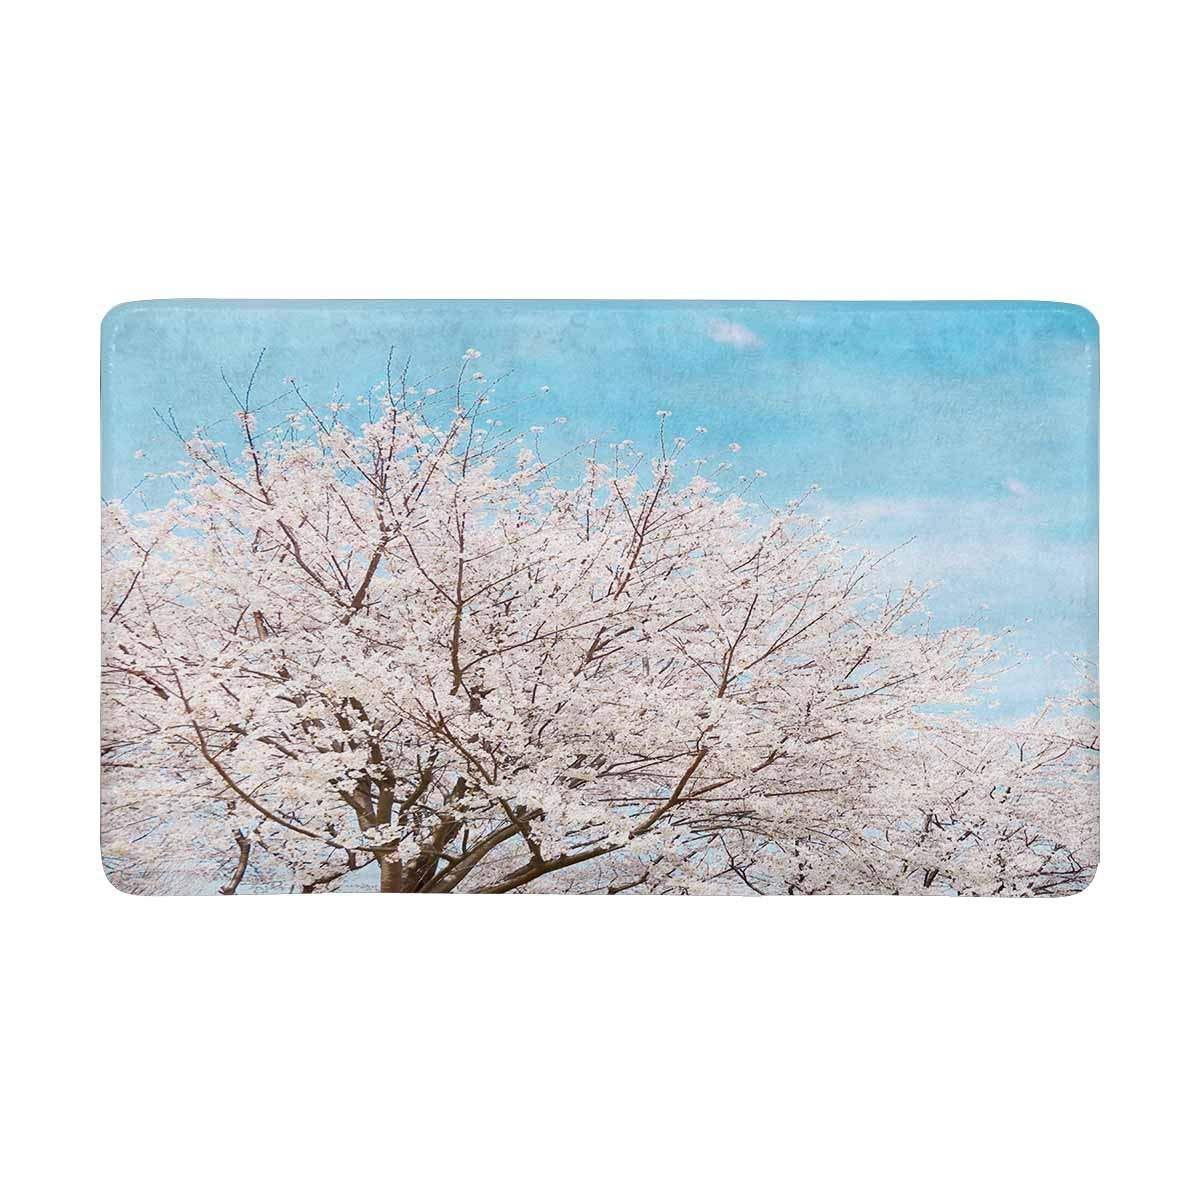 Spring Tree Cherry Blossom Sakura Anti Slip Door Mat Home Decor Indoor Entrance Doormat Mat Aliexpress